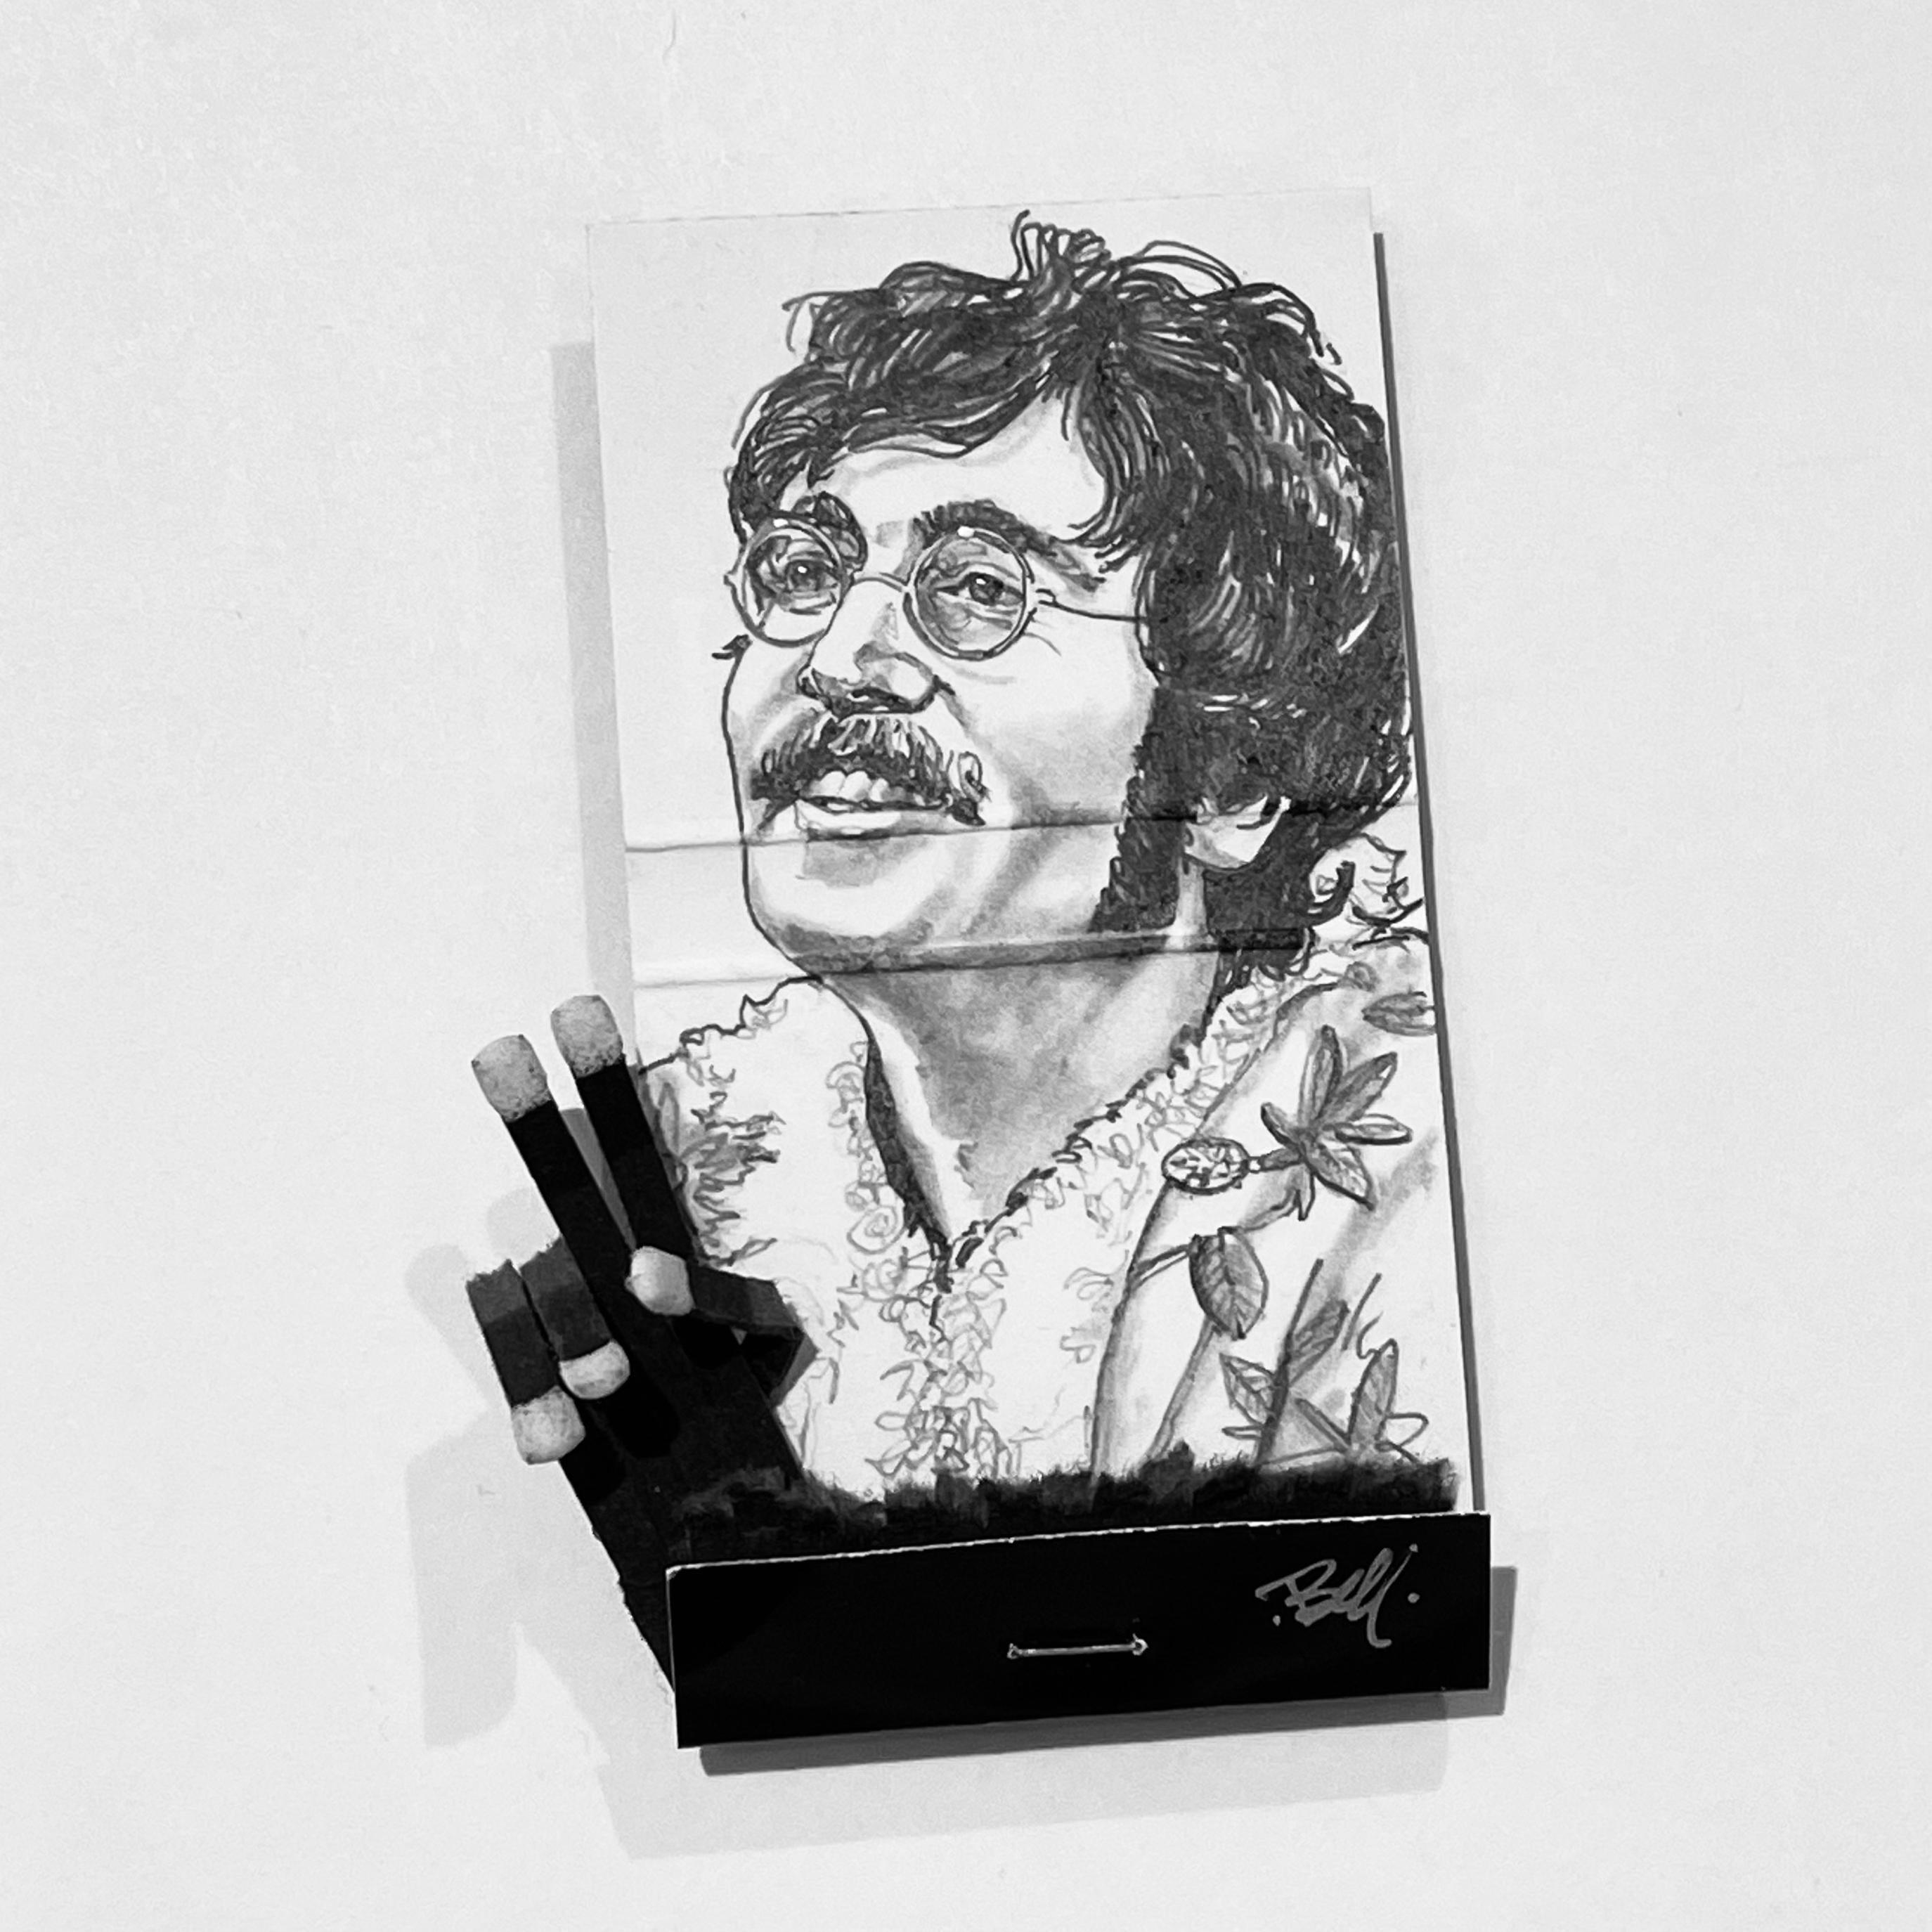 John Lennon - figurative black and white portrait pencil drawing on matchbox